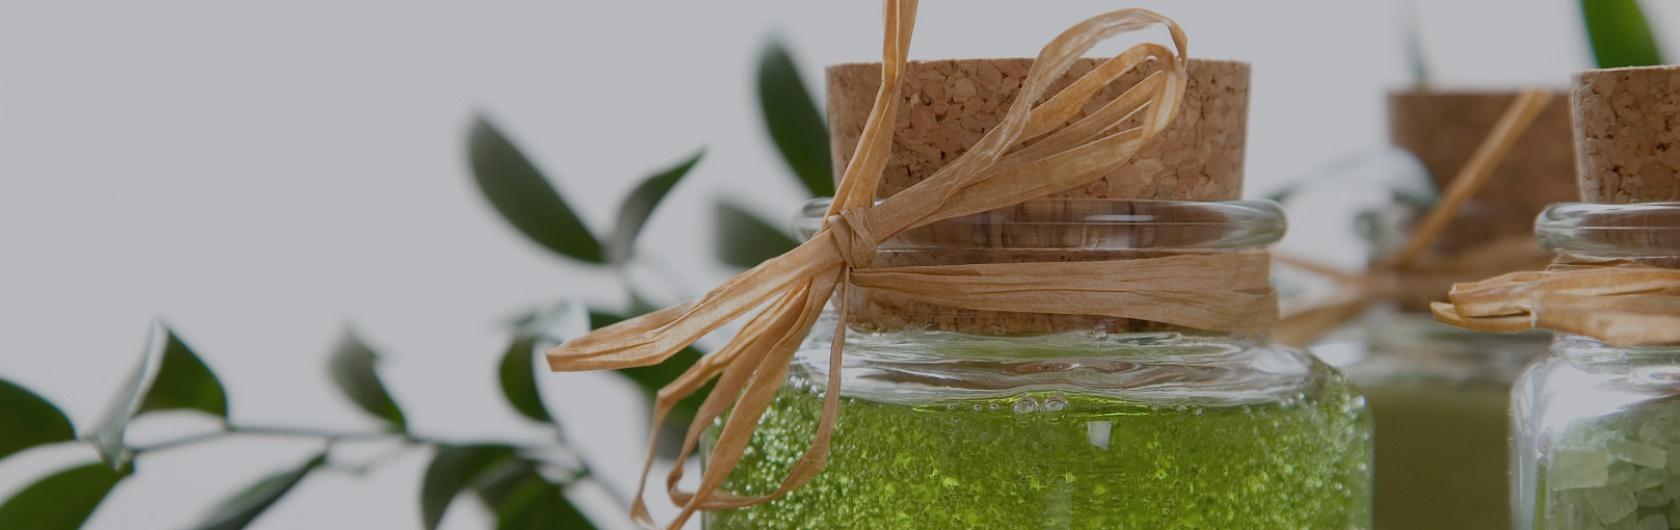 заговор на зеленый чай